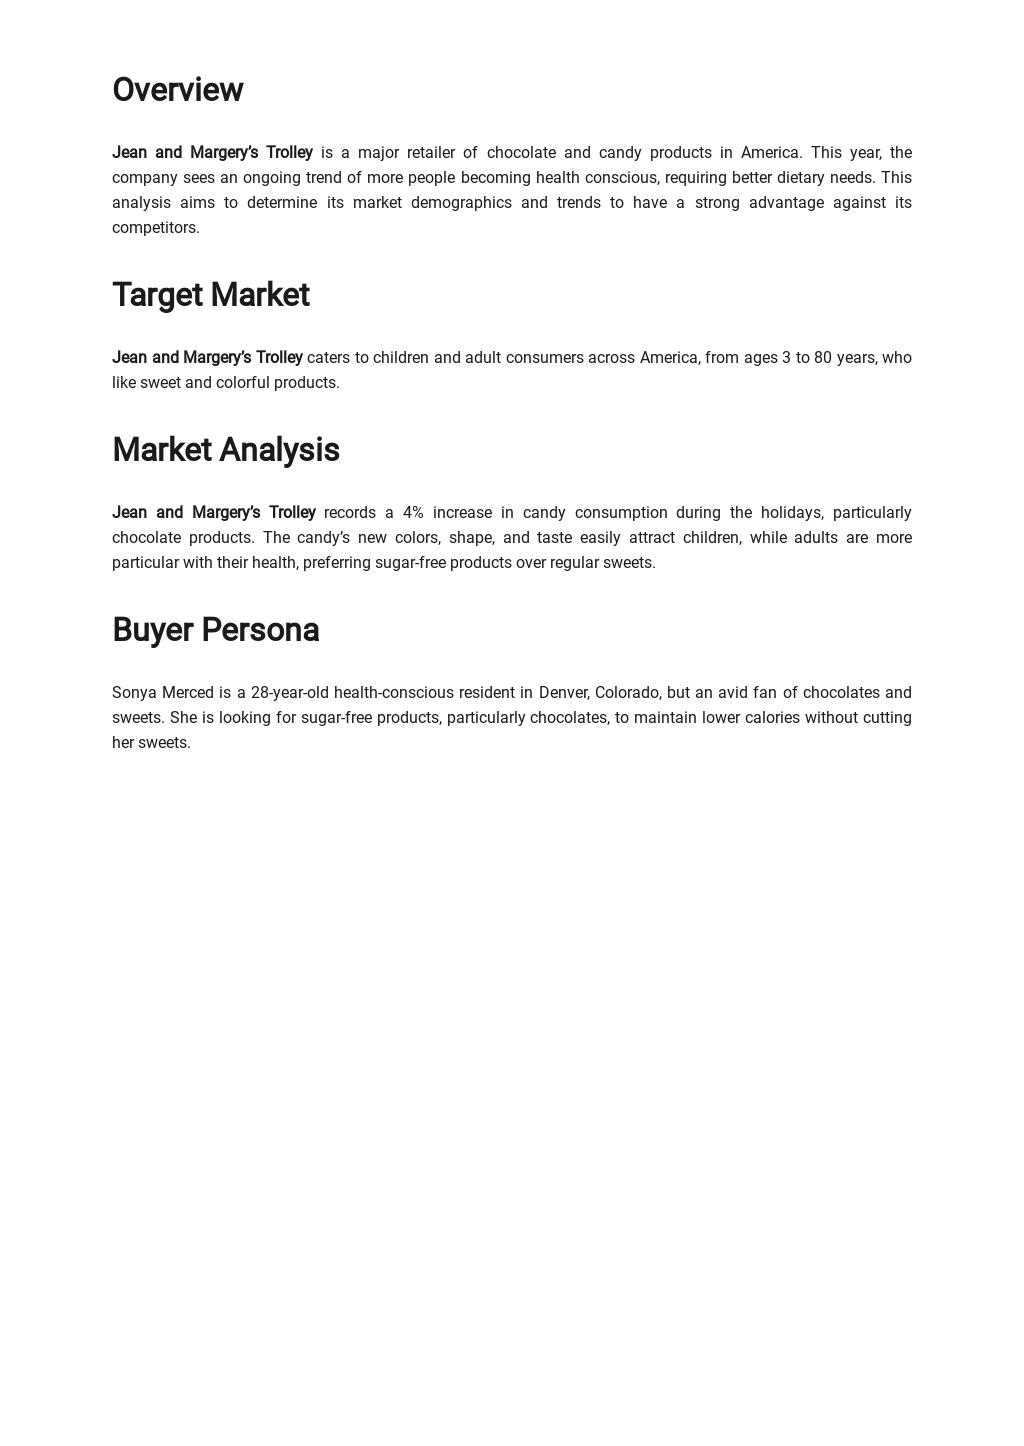 Retail Market Analysis Template [Free PDF] - Google Docs, Word, Apple Pages